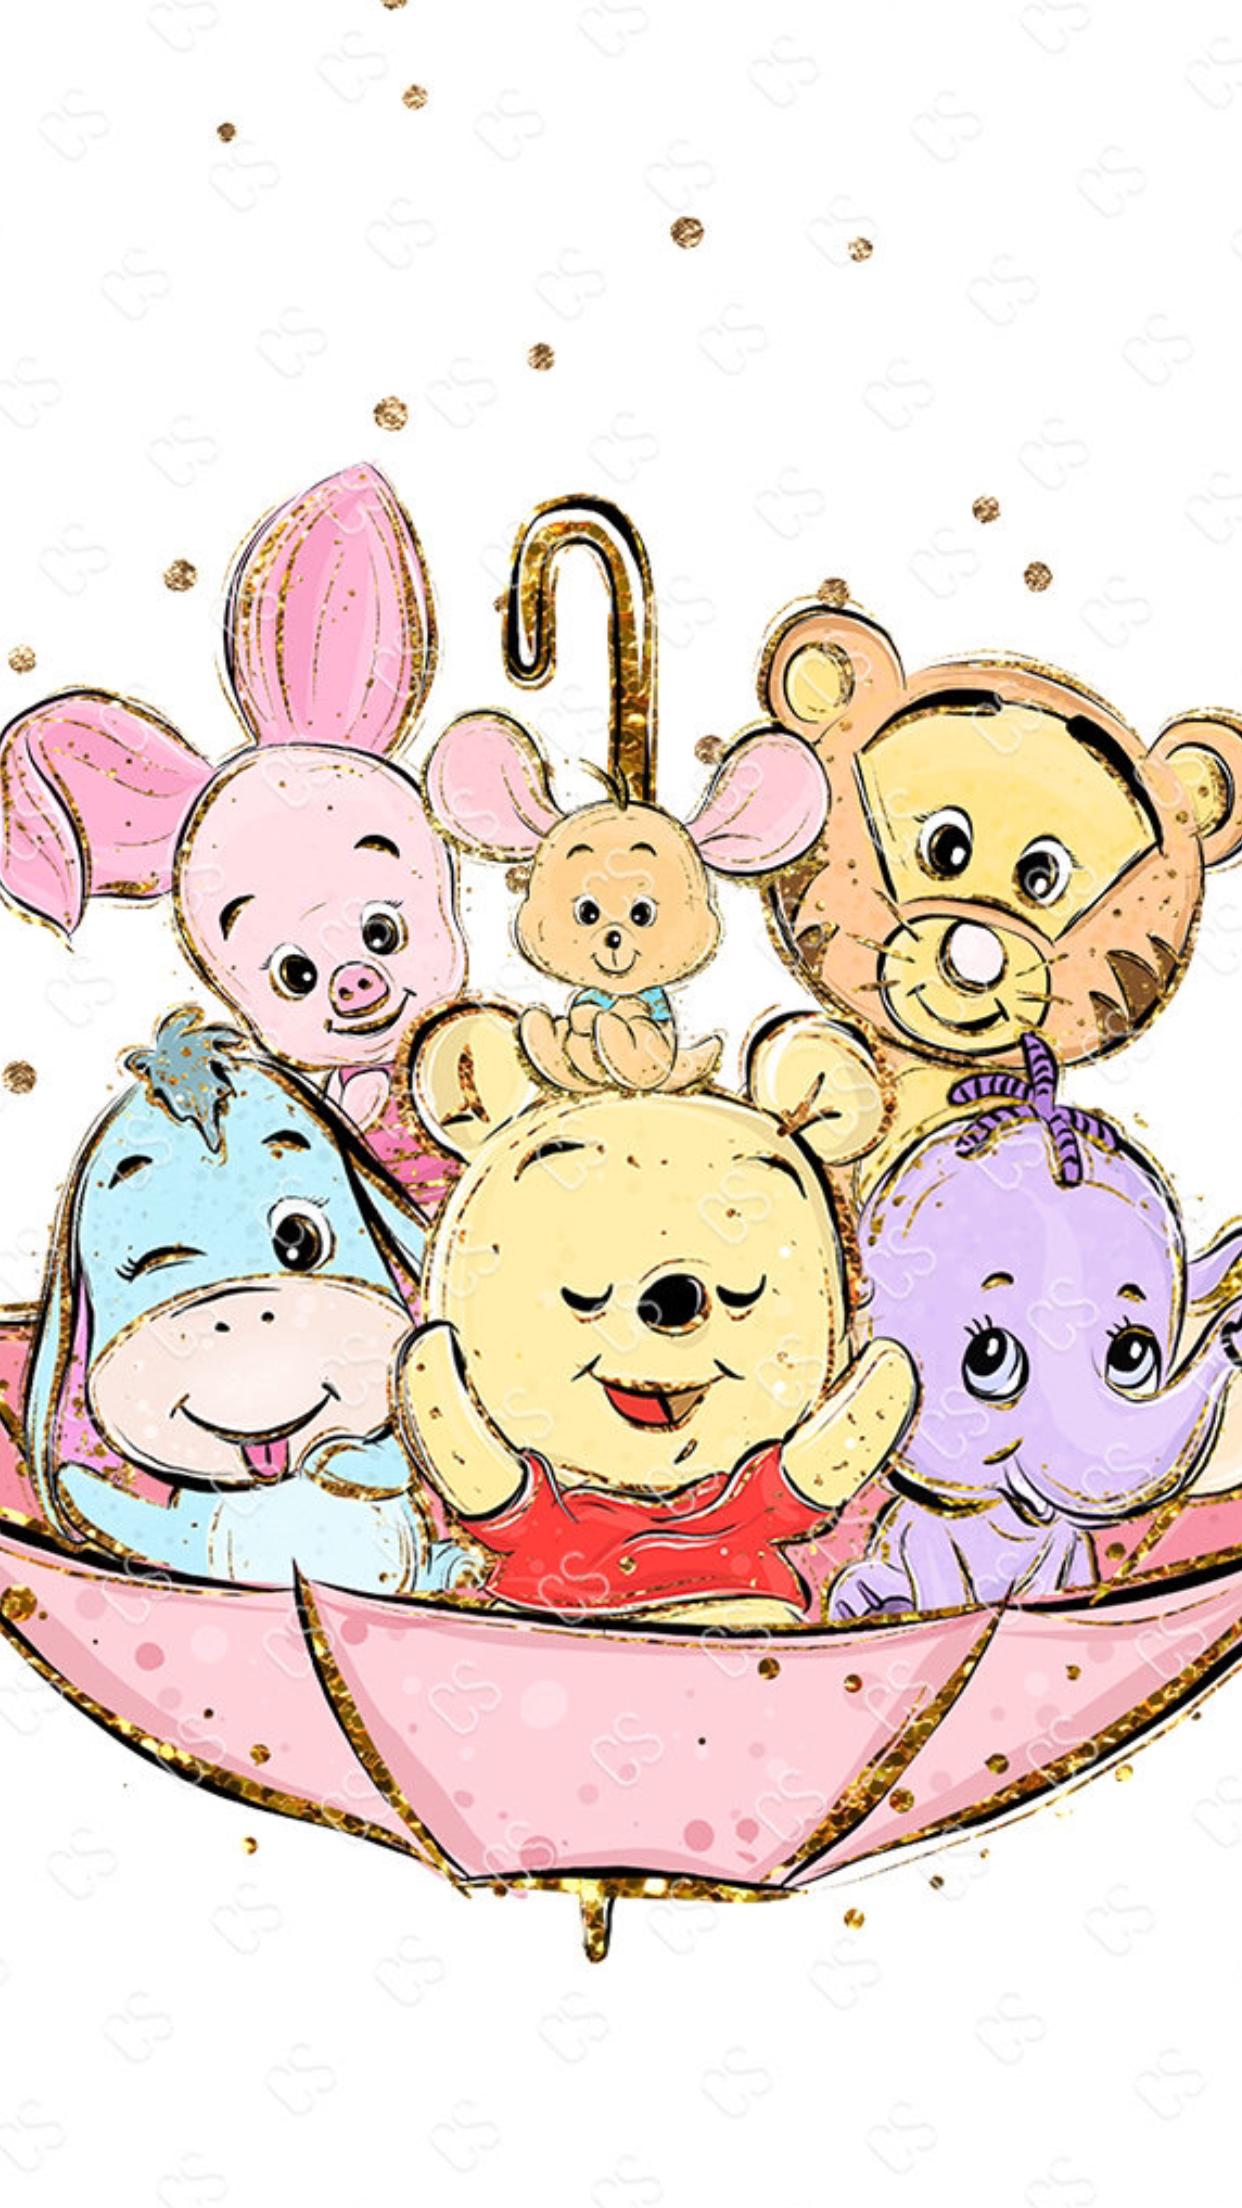 Pin By Brandi Green On Clipart Baby Cute Disney Drawings Cute Winnie The Pooh Wallpaper Iphone Disney